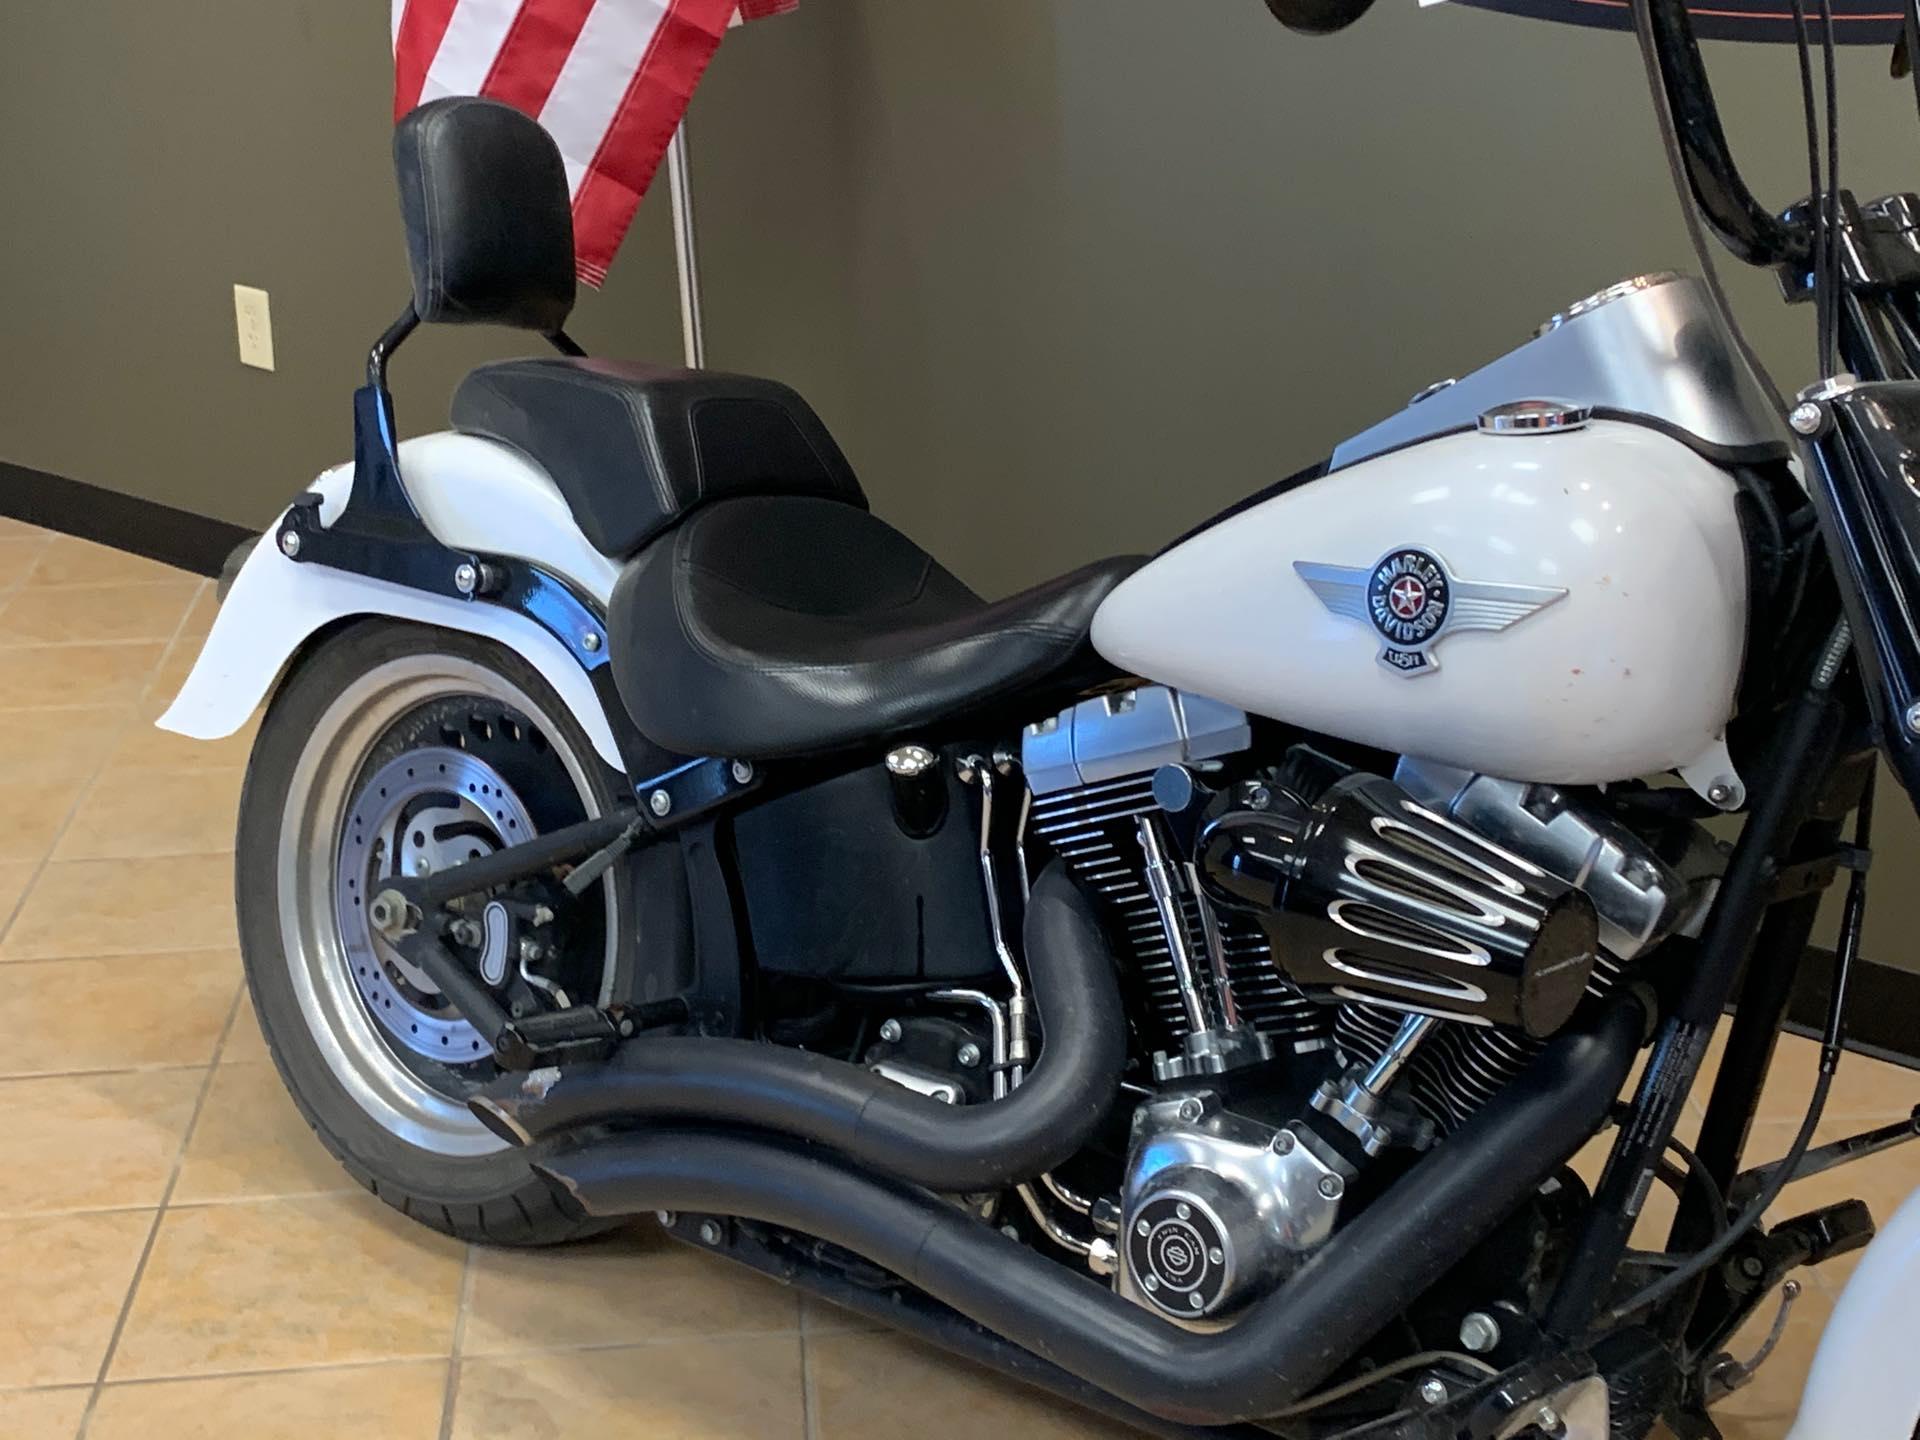 2011 Harley-Davidson Softail Fat Boy Lo at Loess Hills Harley-Davidson